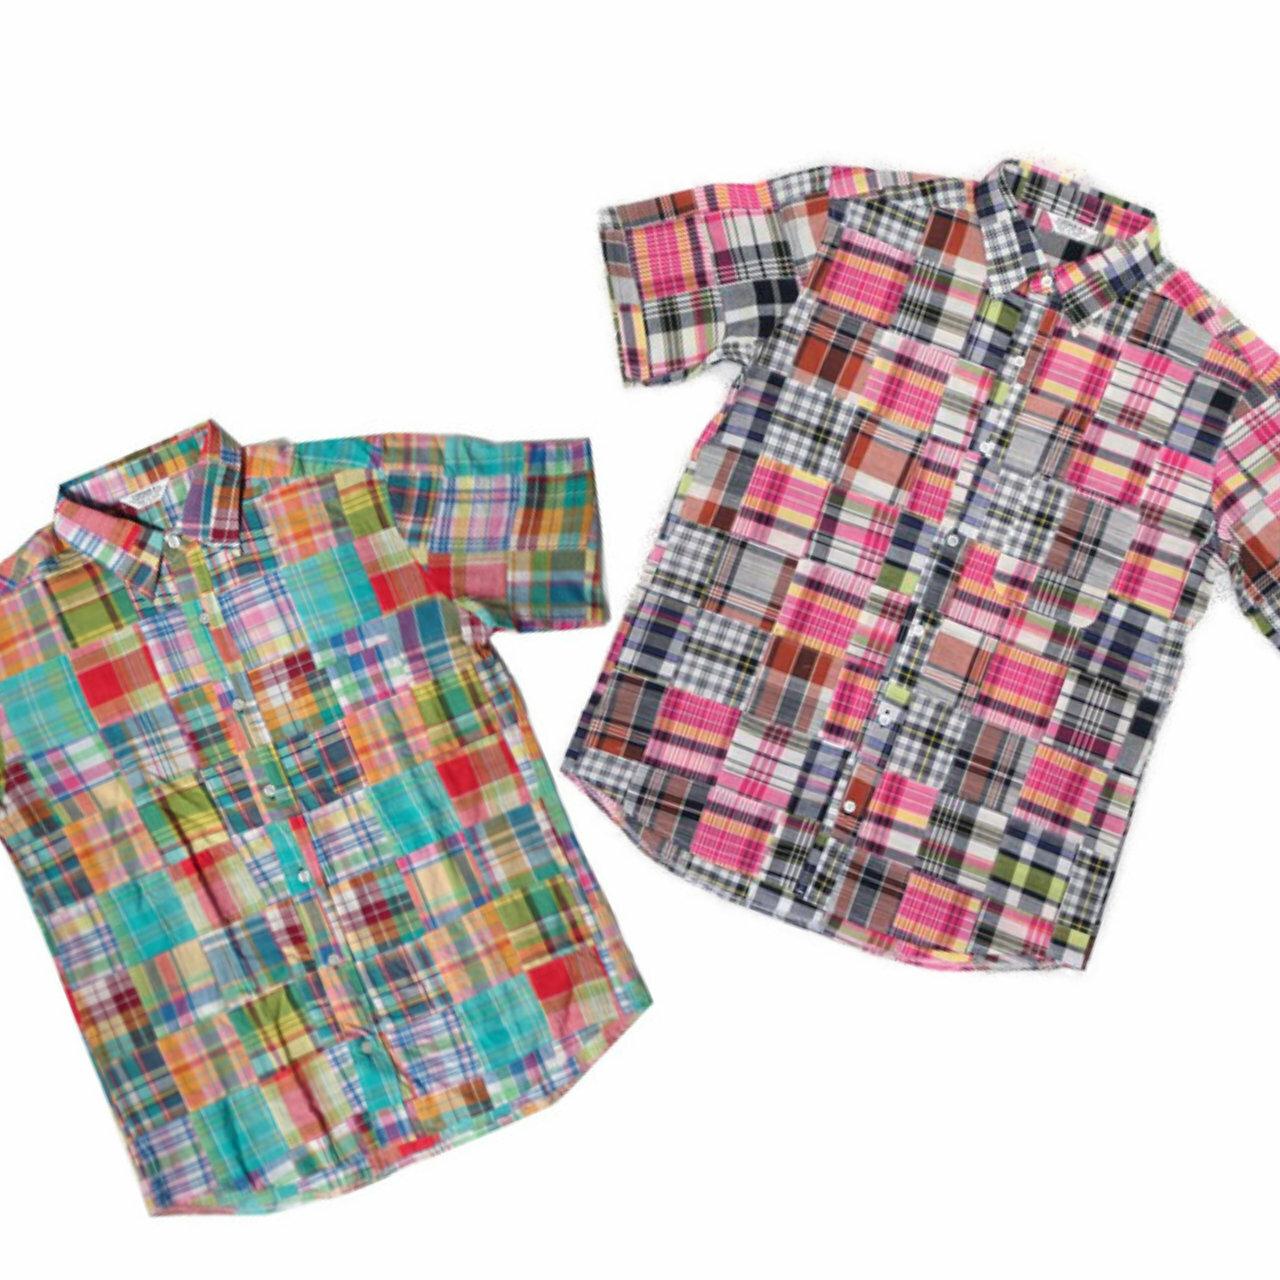 Patchwork S/S Shirts | パッチワーク チェック 半袖シャツ 【VINTAGE EL】